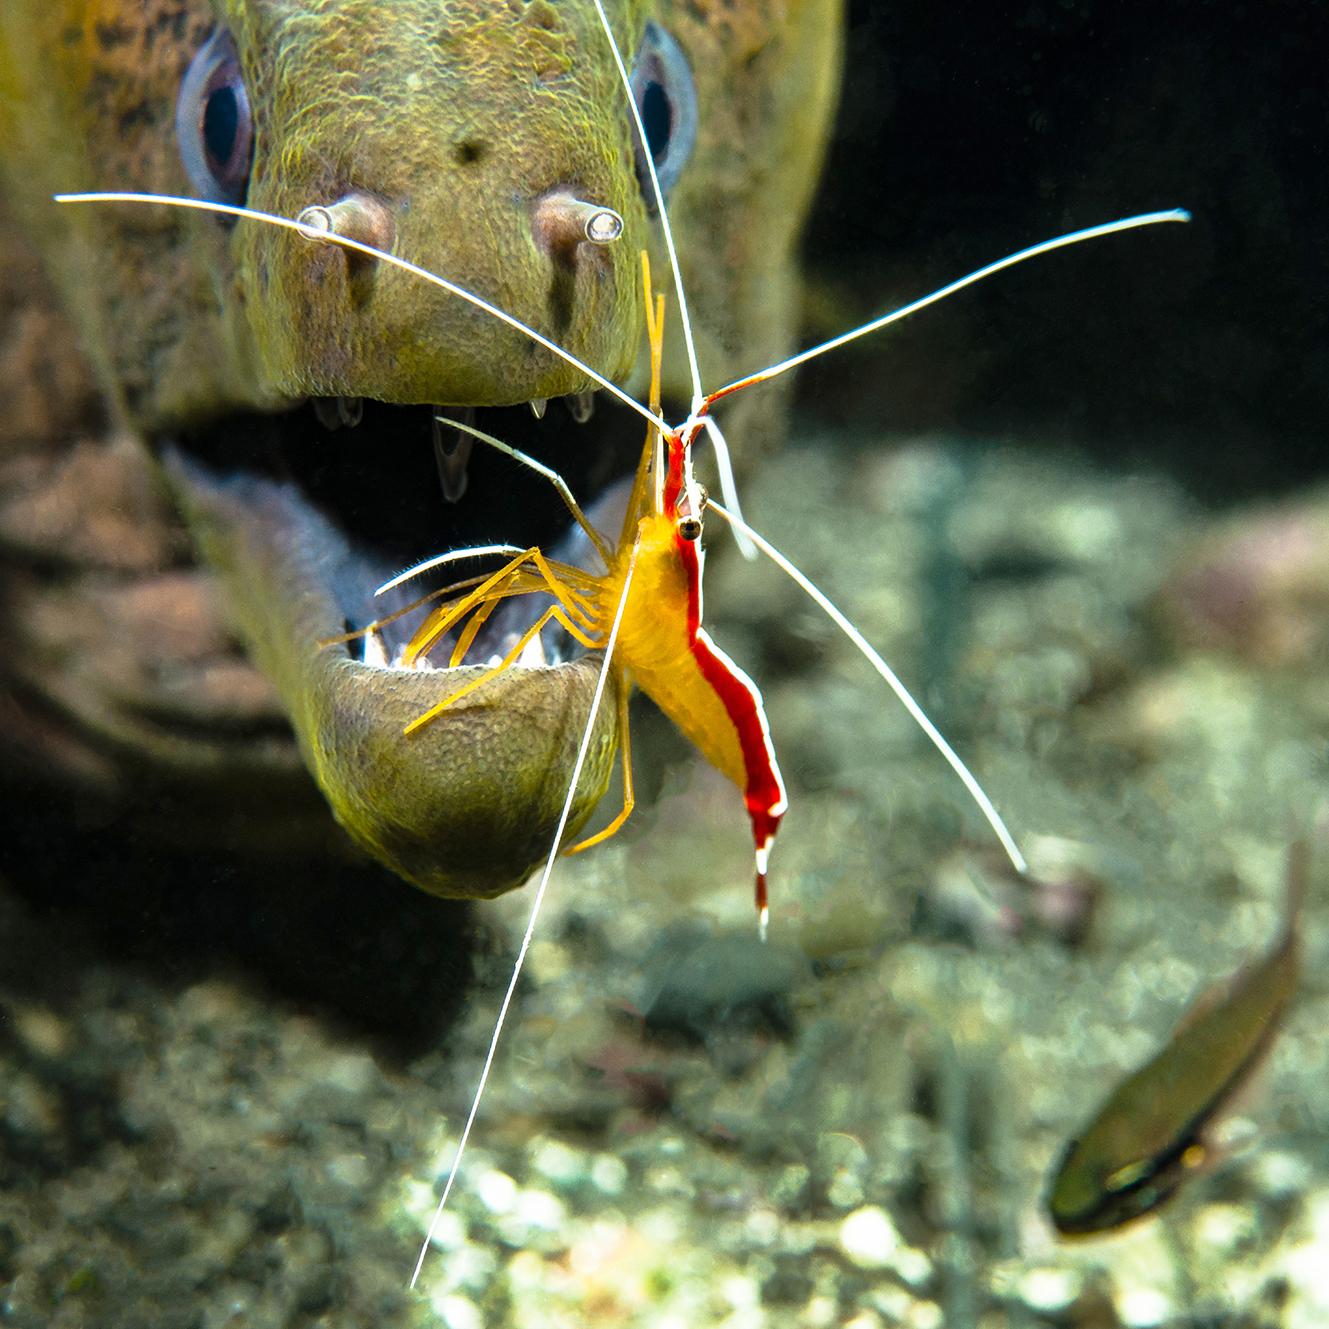 cleaning shrimp at Lawadi